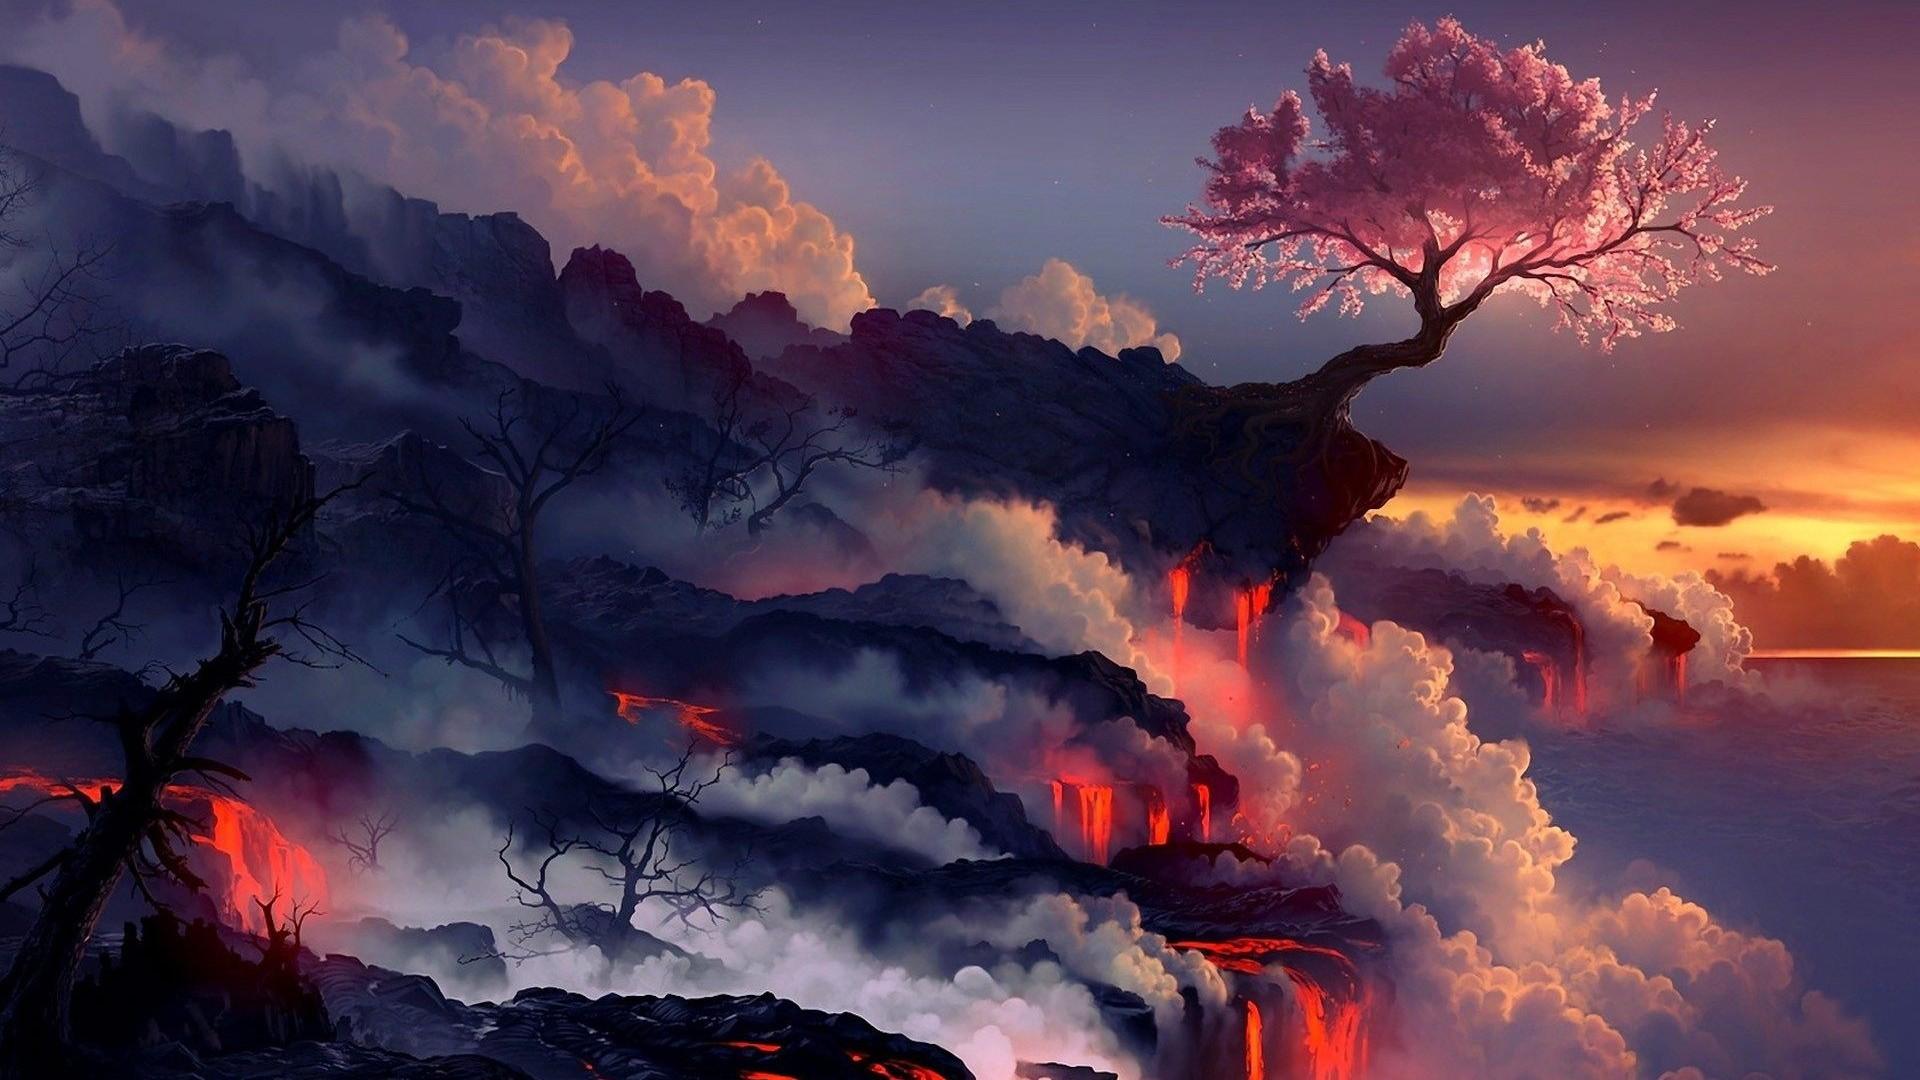 Japanese Desktop Wallpaper Posted By Sarah Mercado